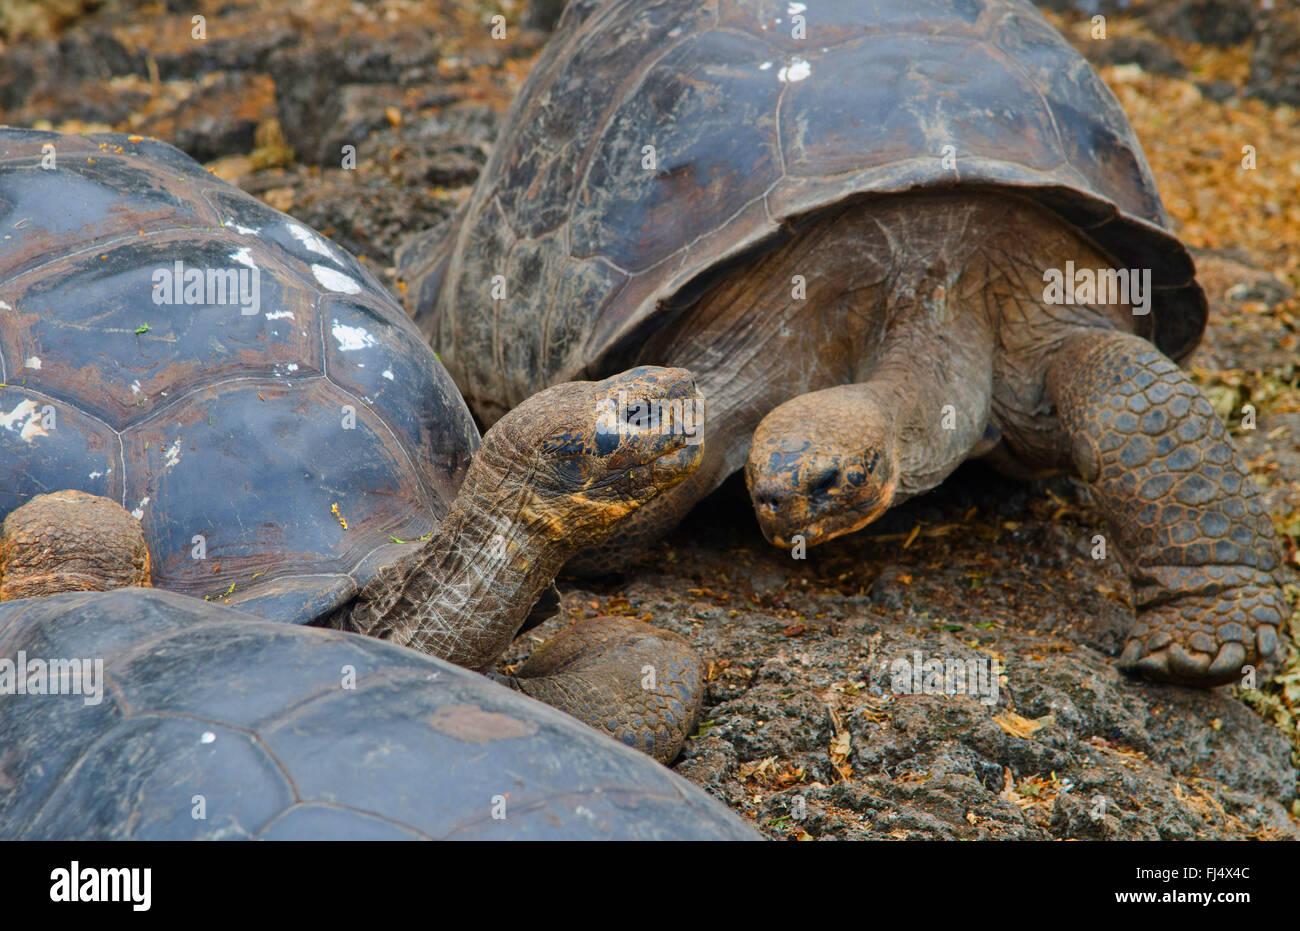 Galapagos-Schildkröte, Galapagos-Riesenschildkröte (Porteri) (Chelonodis Nigra Porteri, Geochelone Elephantopus Stockbild